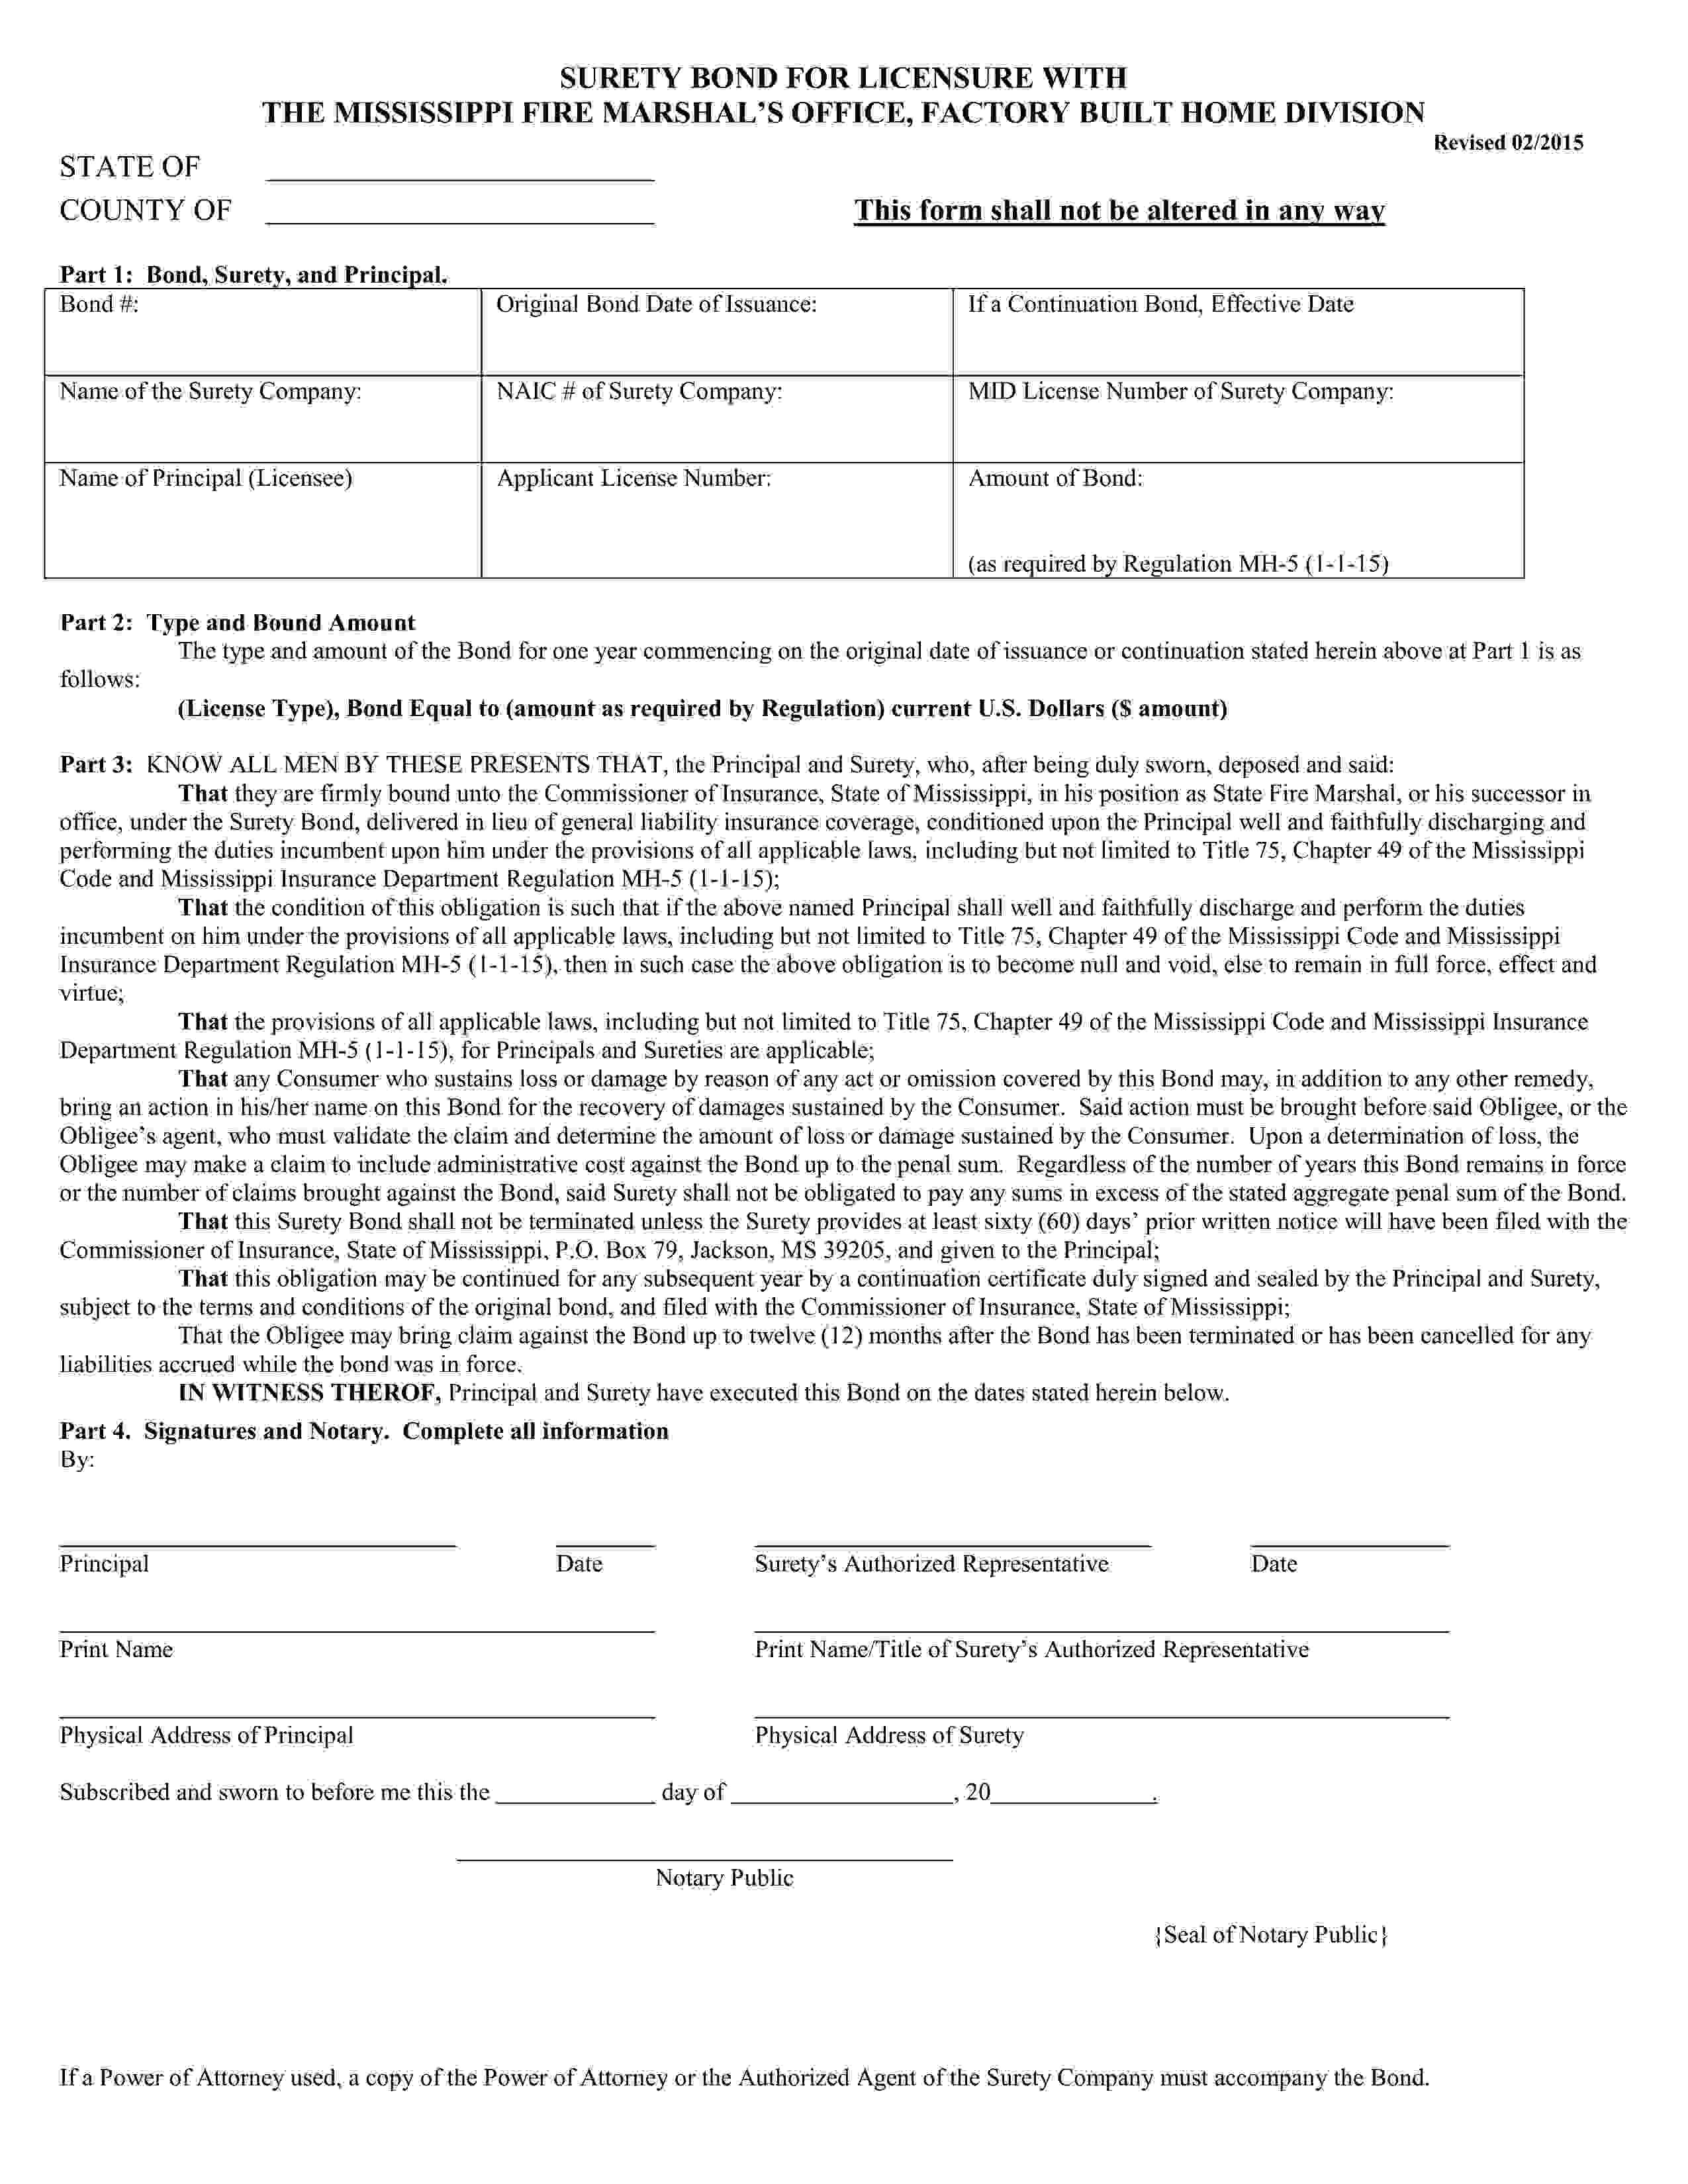 Mississippi Commissioner of Insurance Manufactured Home Manufacturer or Modular Contractor Bond sample image